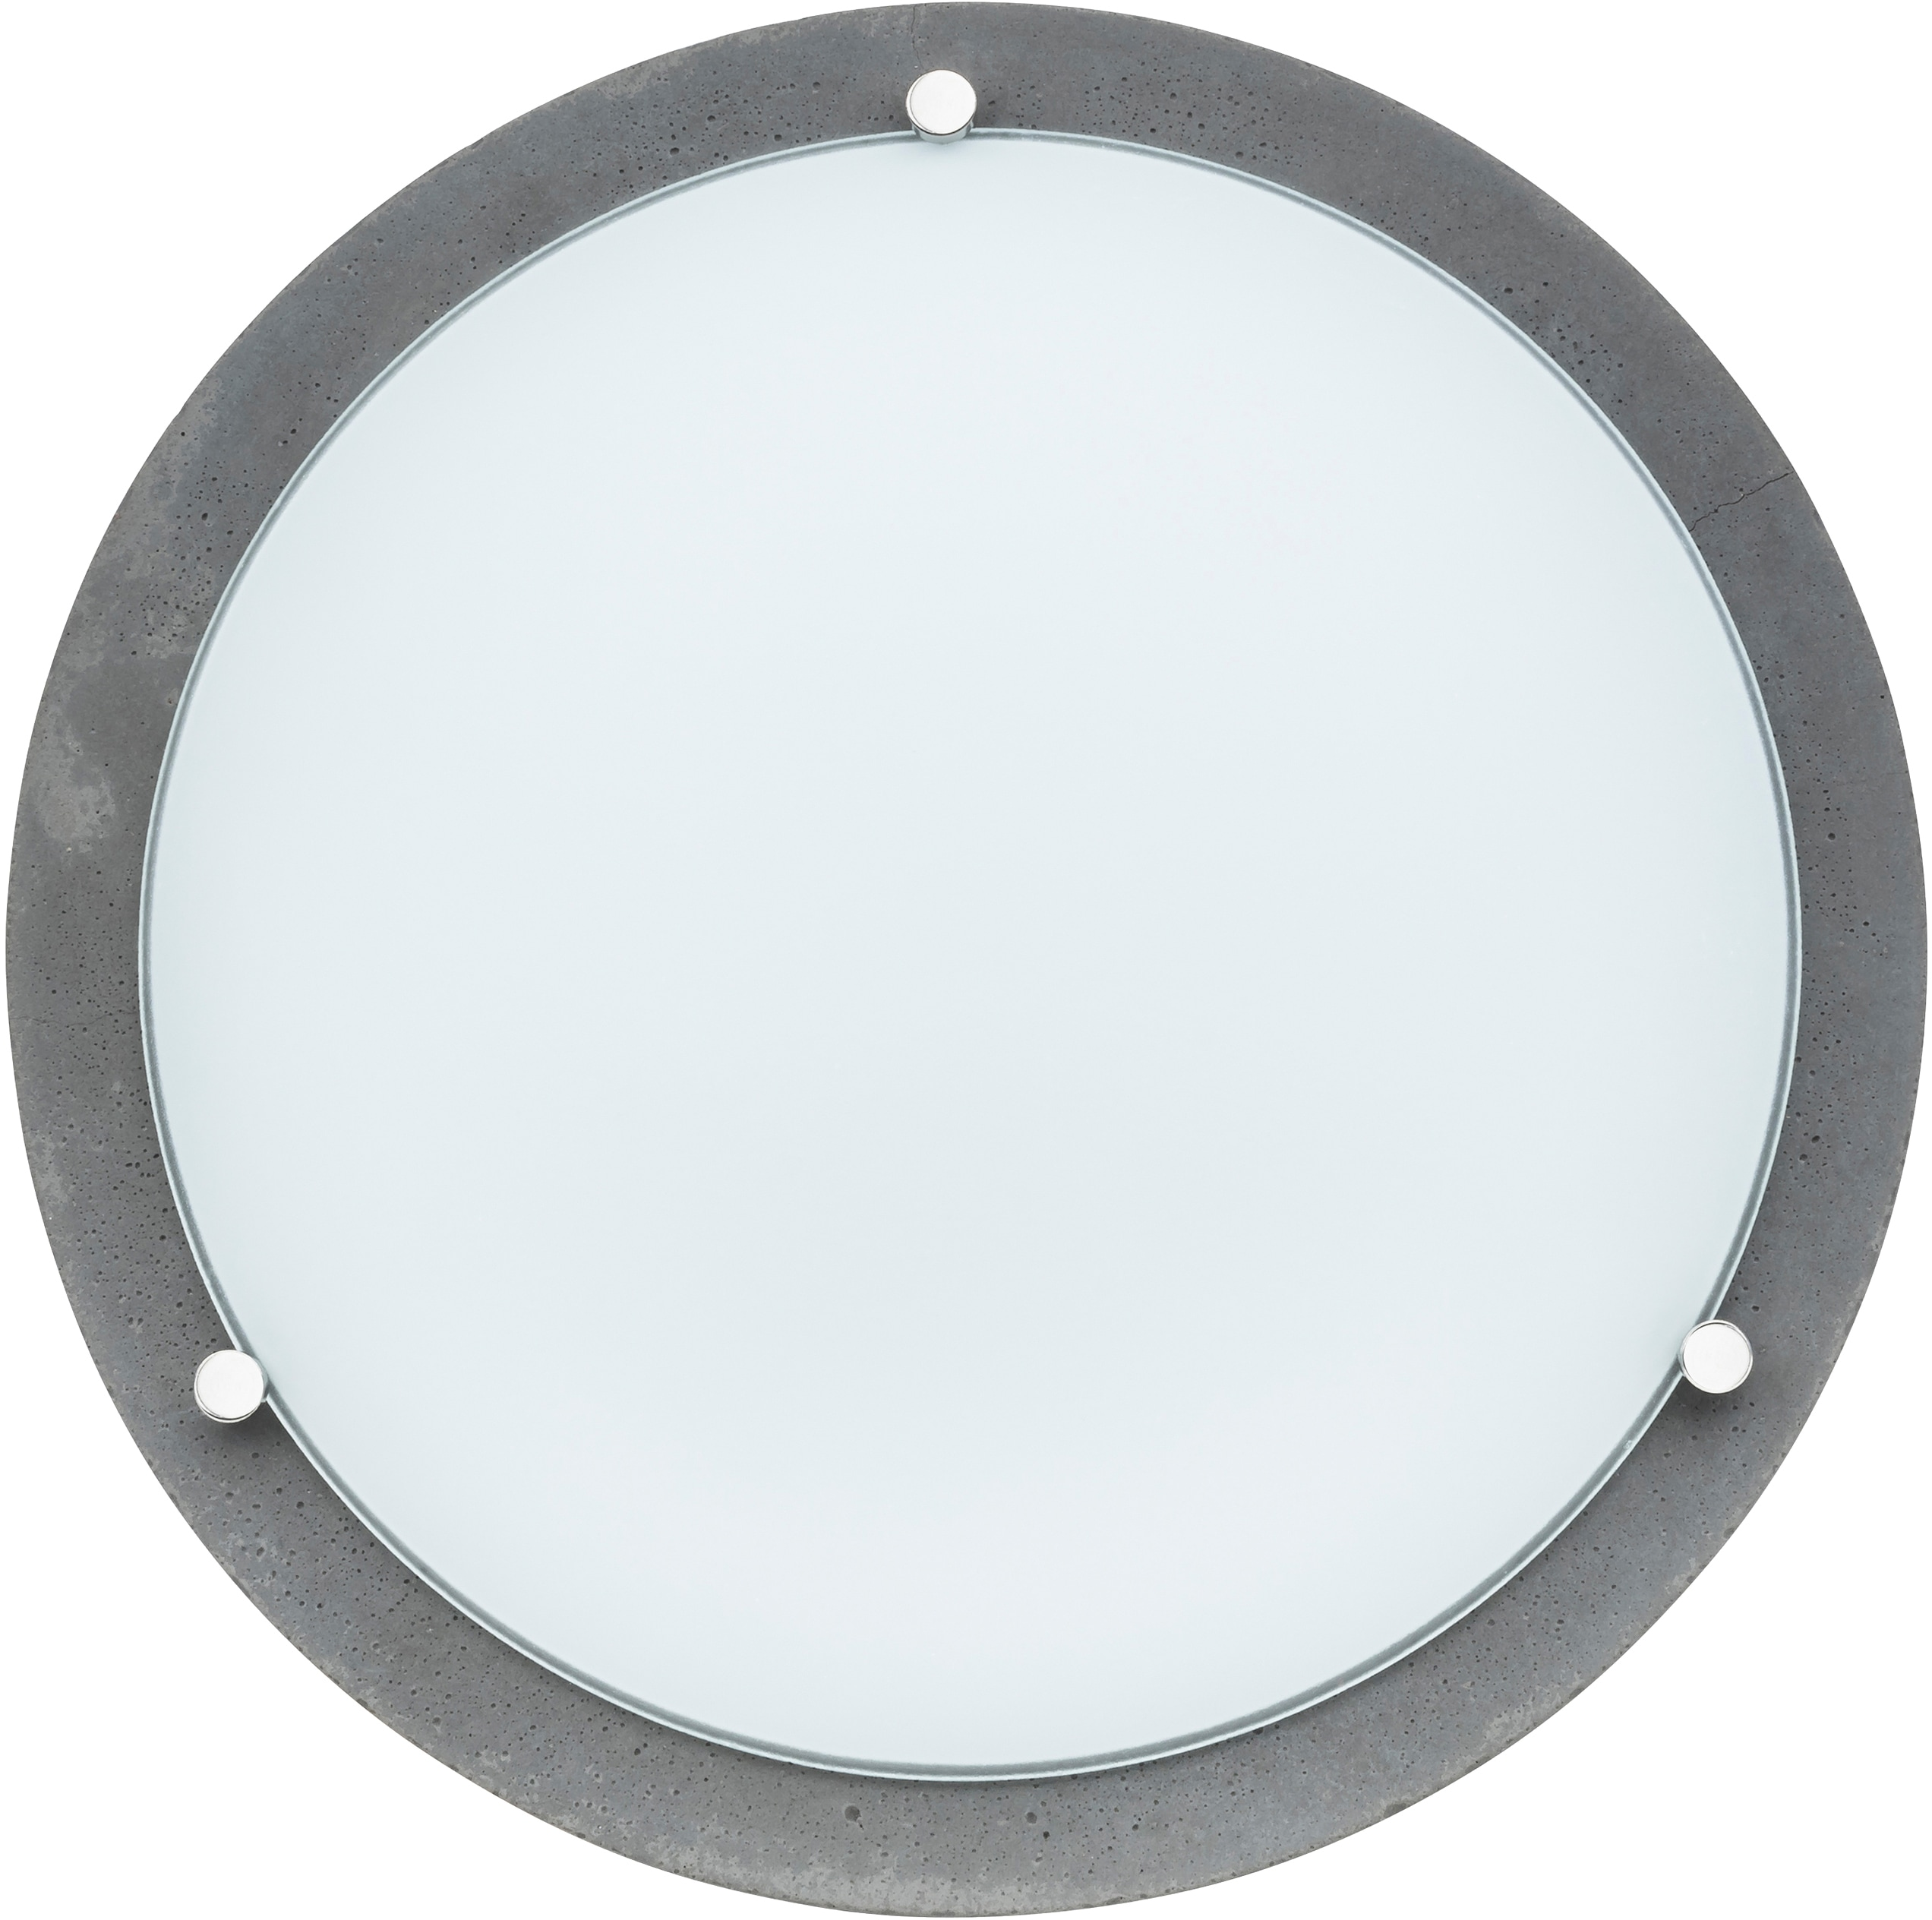 SPOT Light Deckenleuchte ROCKY, LED-Board, 1 St., Wertige Materialien: echtes Beton und Glas, festintegriertes LED-Leuchtmittel, Naturprodukt - nachhaltig, Made in EU